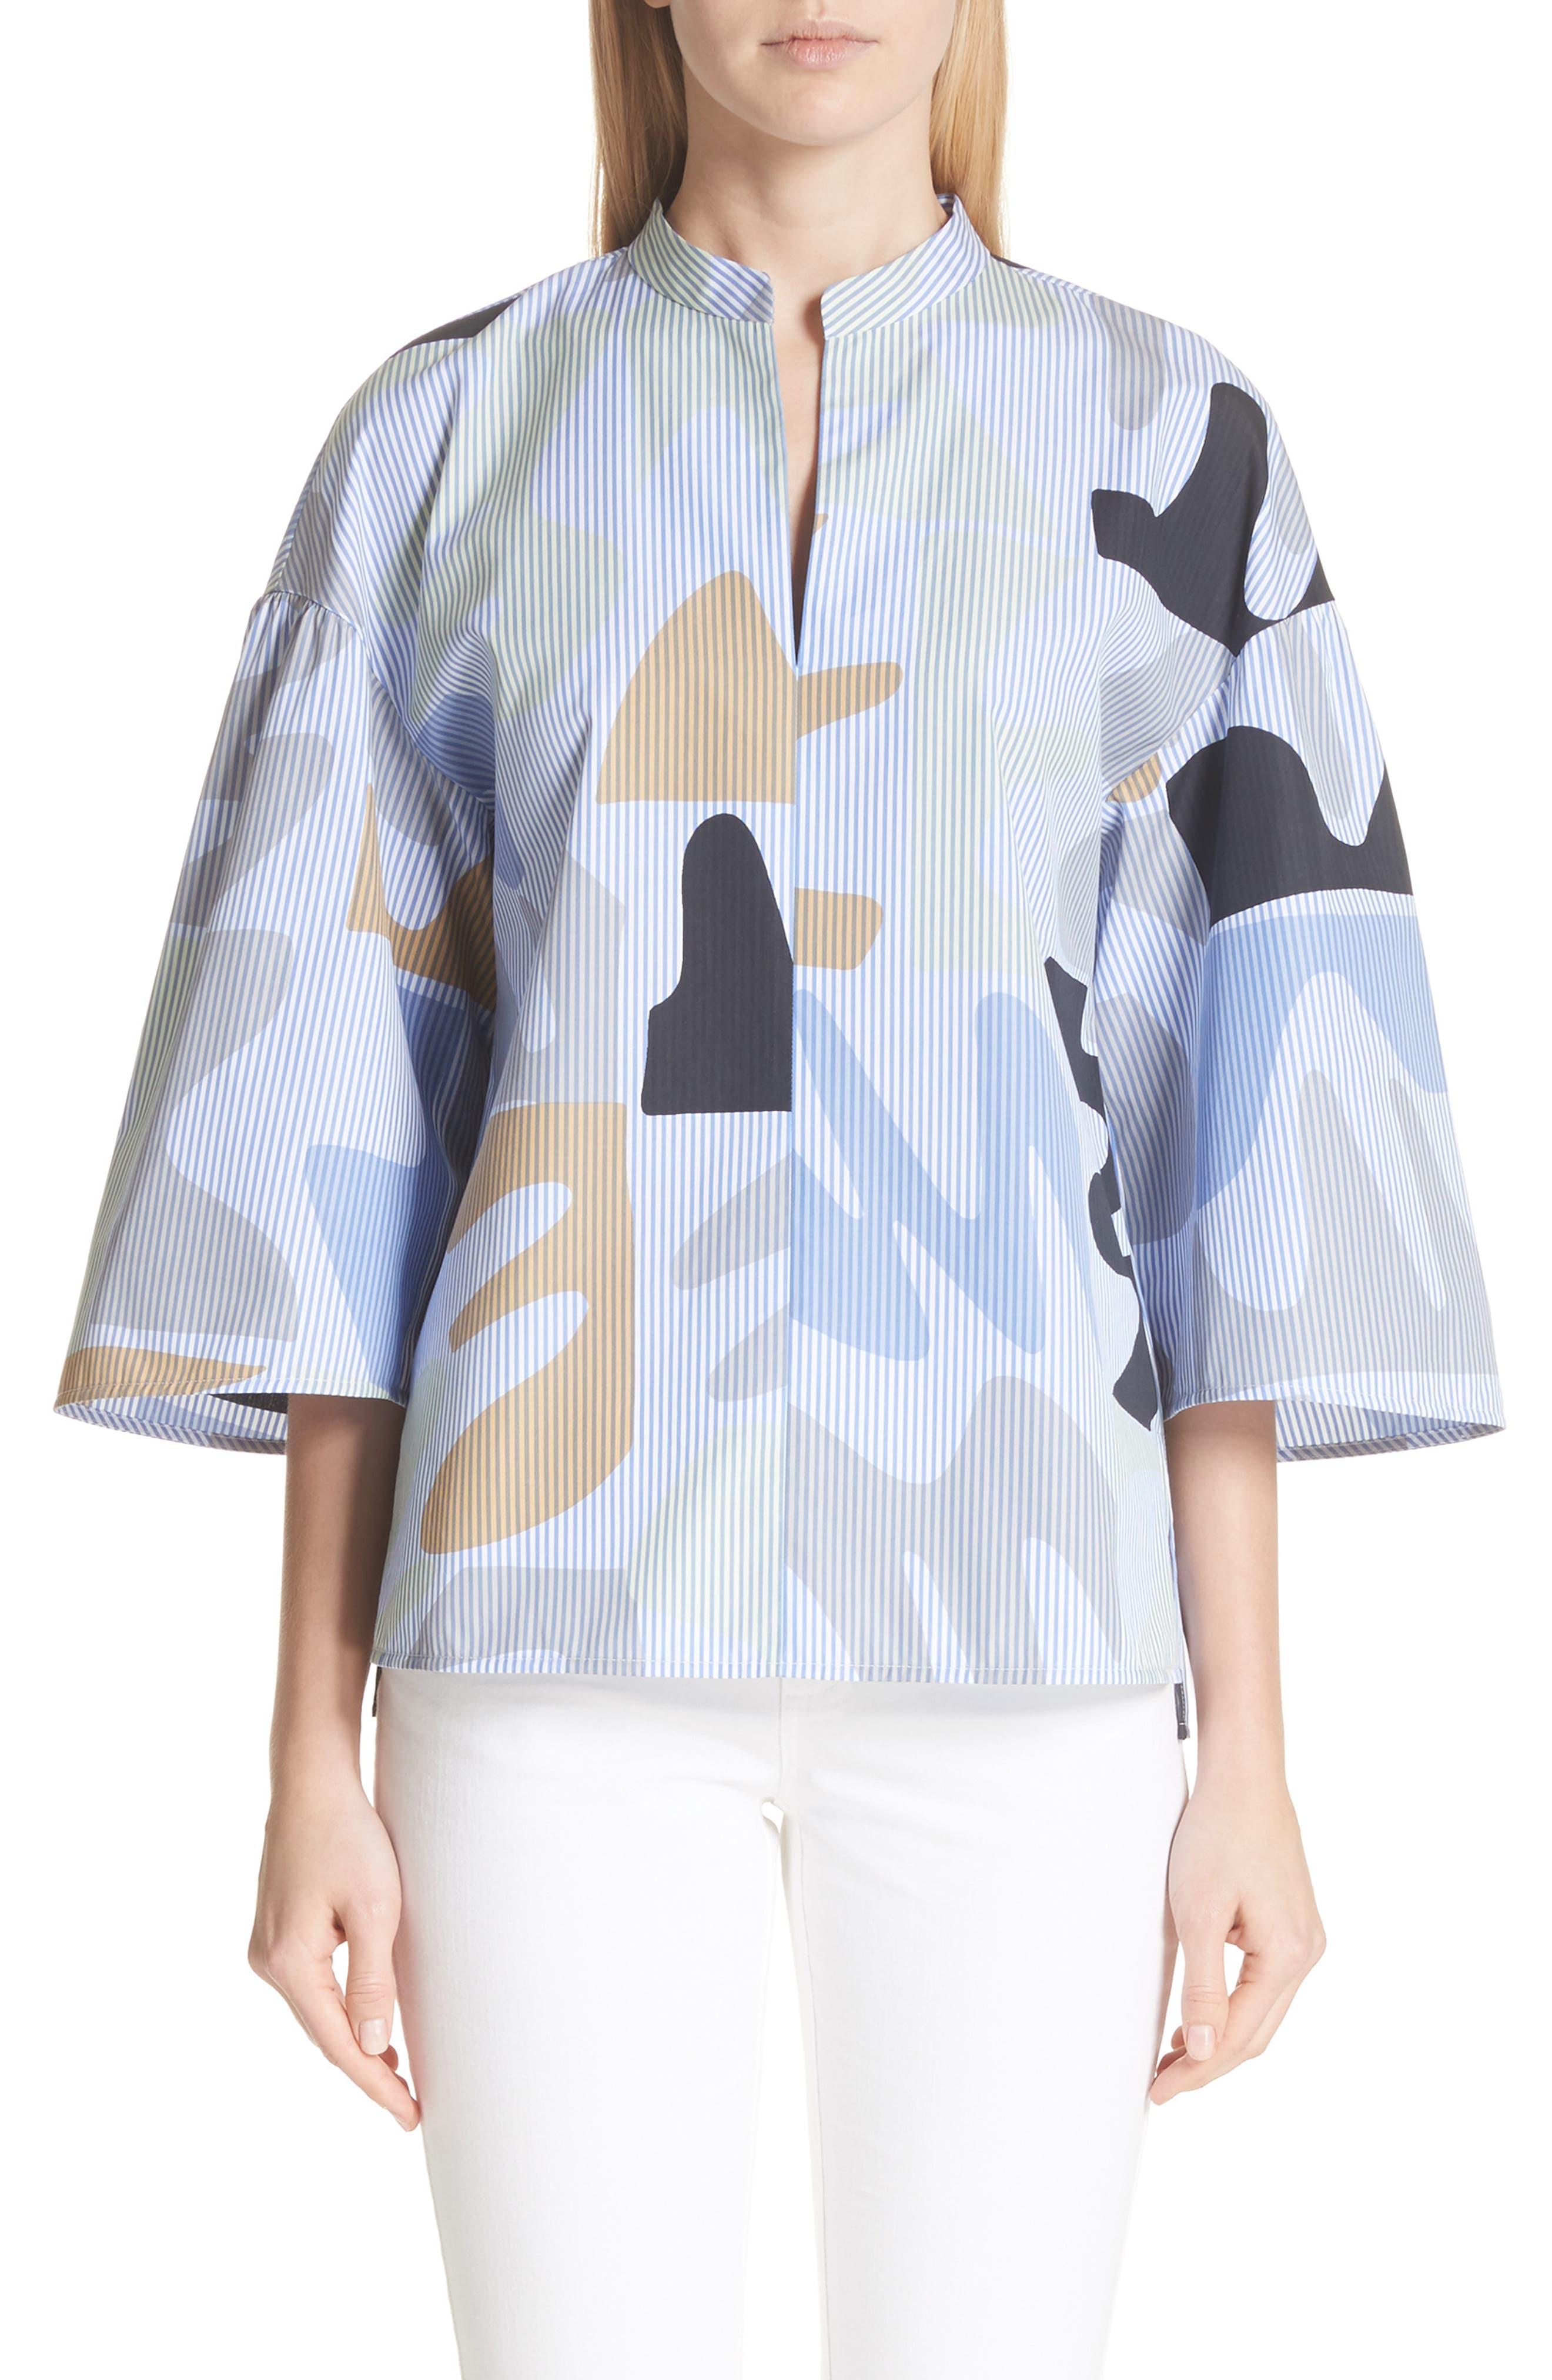 Carla Urban Ethos Stripe Blouse,                         Main,                         color, Periwinkle Multi